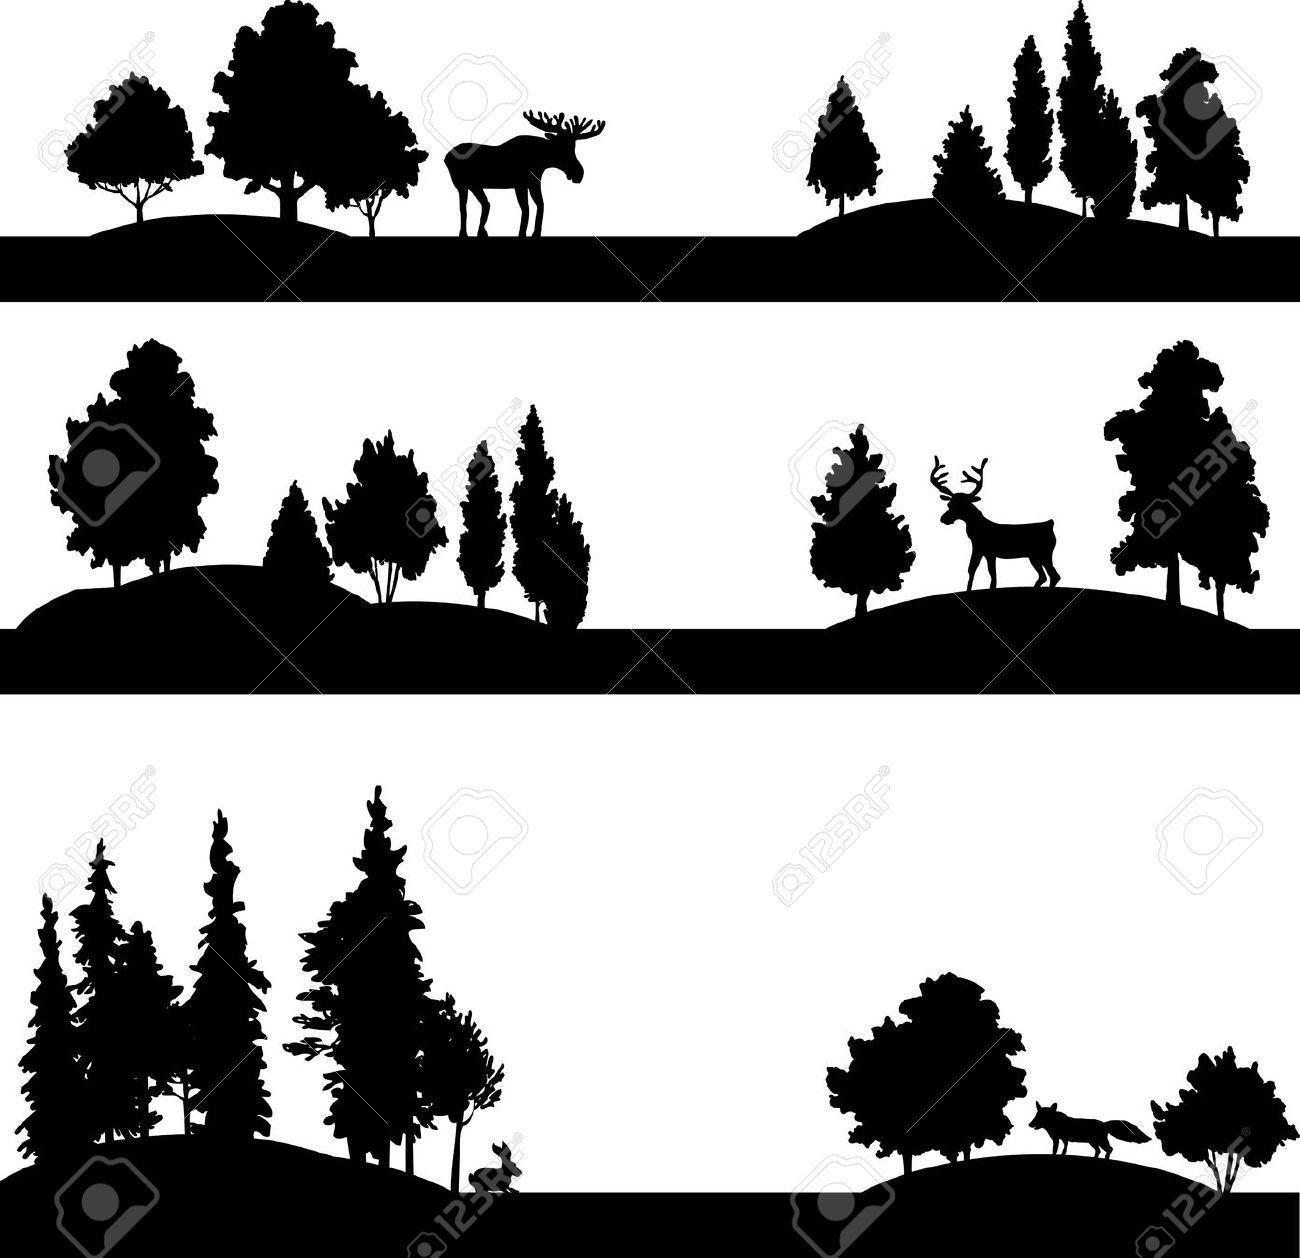 Stock Vector Fox silhouette, Silhouette art, Silhouette